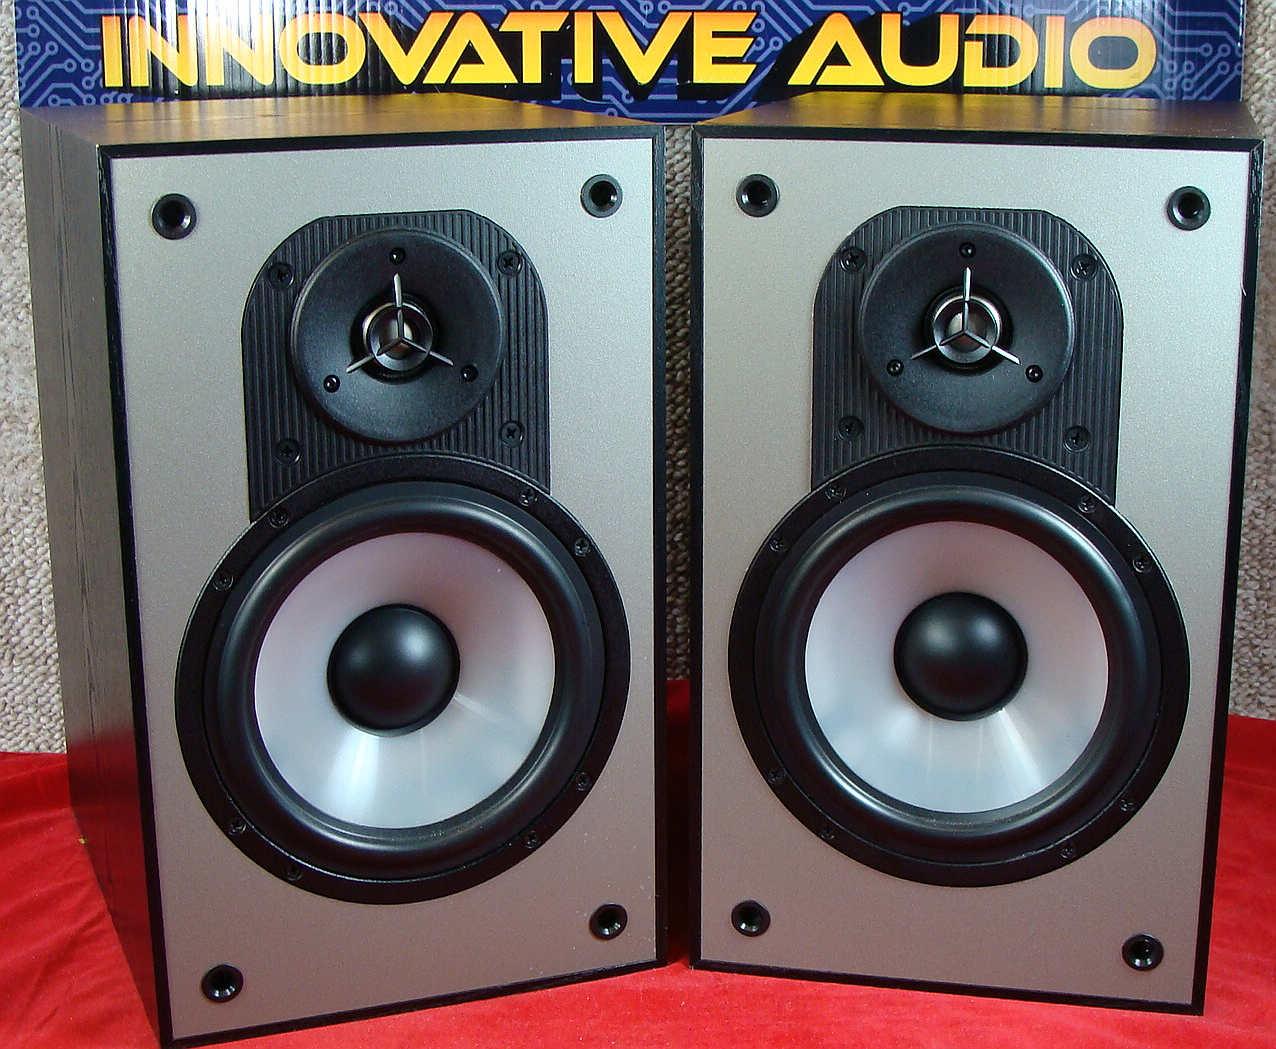 Innovative Audio Paradigm Mini Monitors V2 Front No Grills